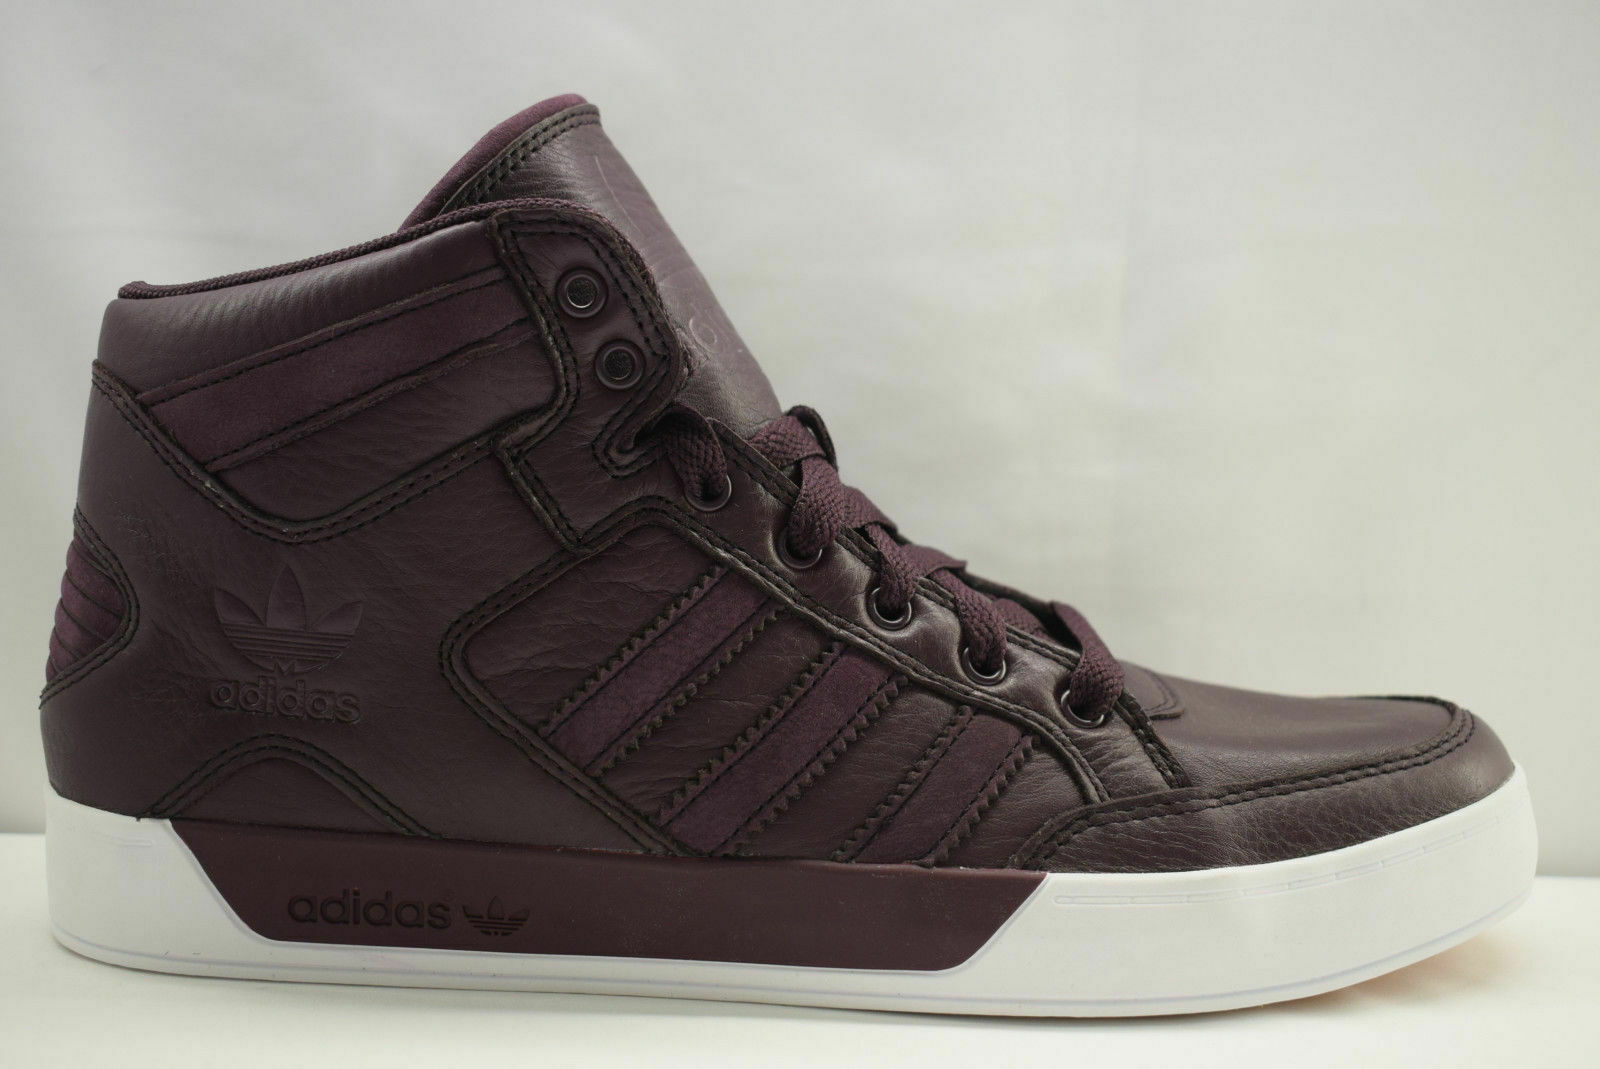 Hombre Adidas Hardcourt Hi Piel Granate Borgoña blancoo BB6782